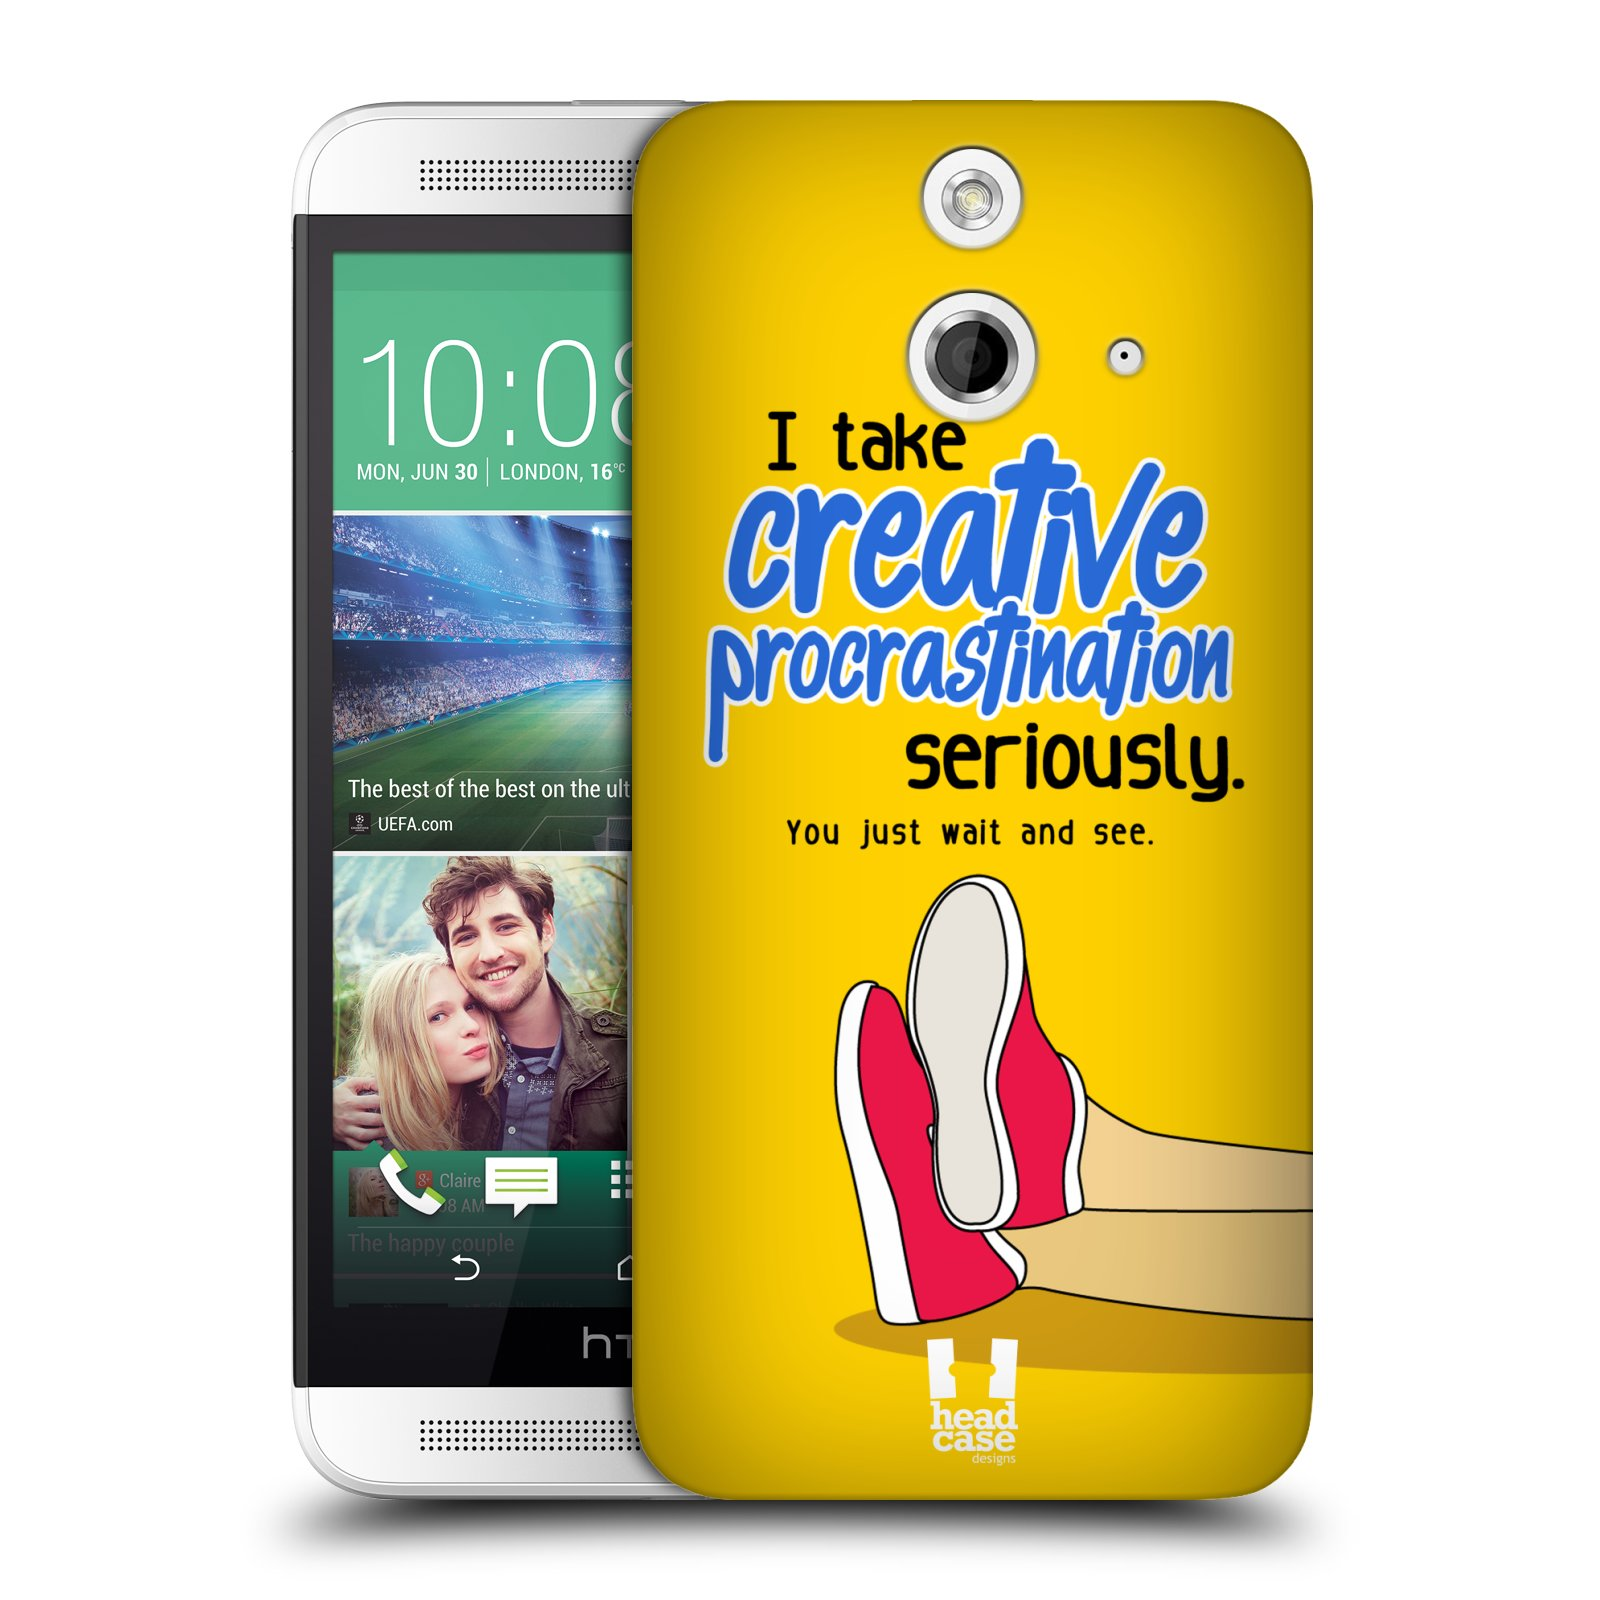 HEAD CASE DESIGNS PROCRASTINATORS HARD BACK CASE FOR HTC ONE E8 DUAL SIM